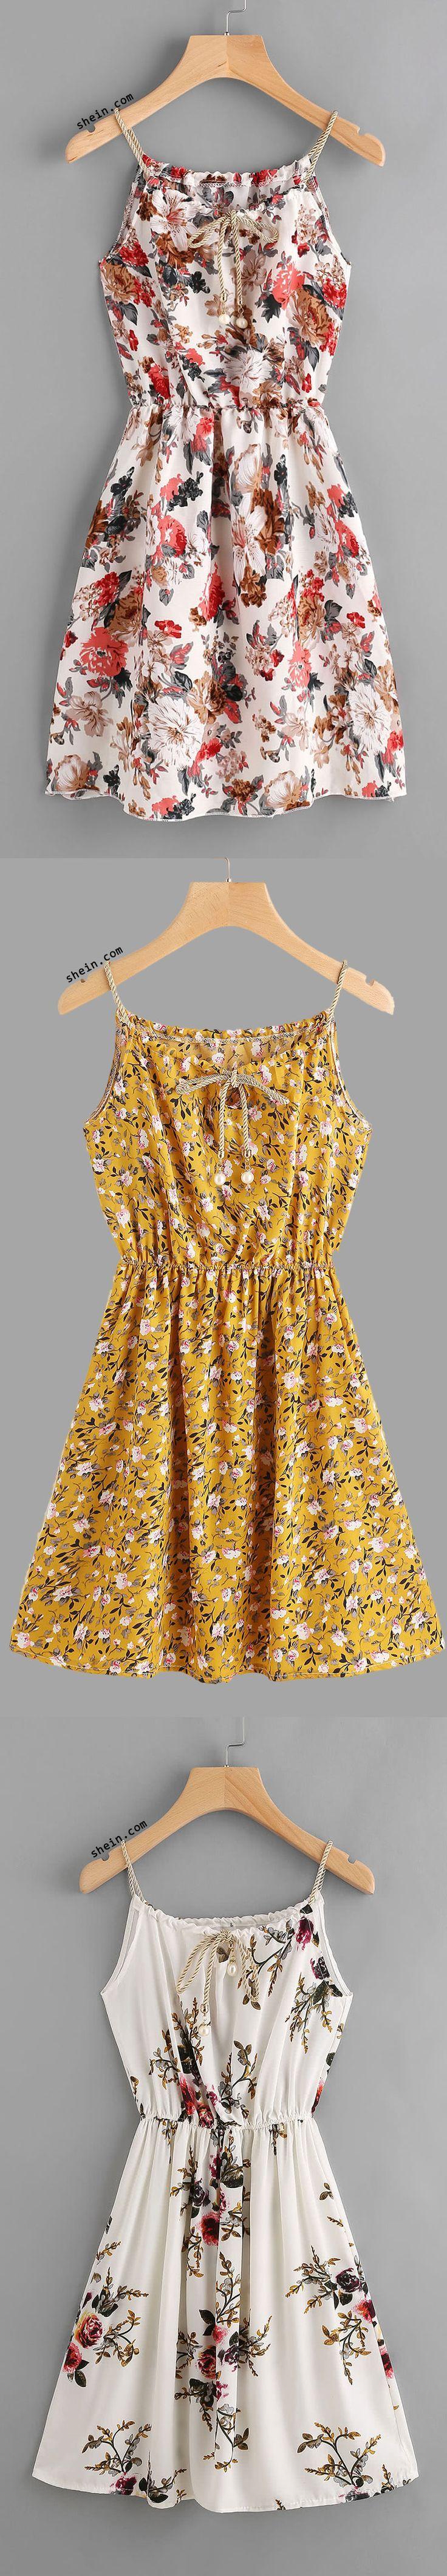 Braided Bead Strap Self Tie Calico Print Dress